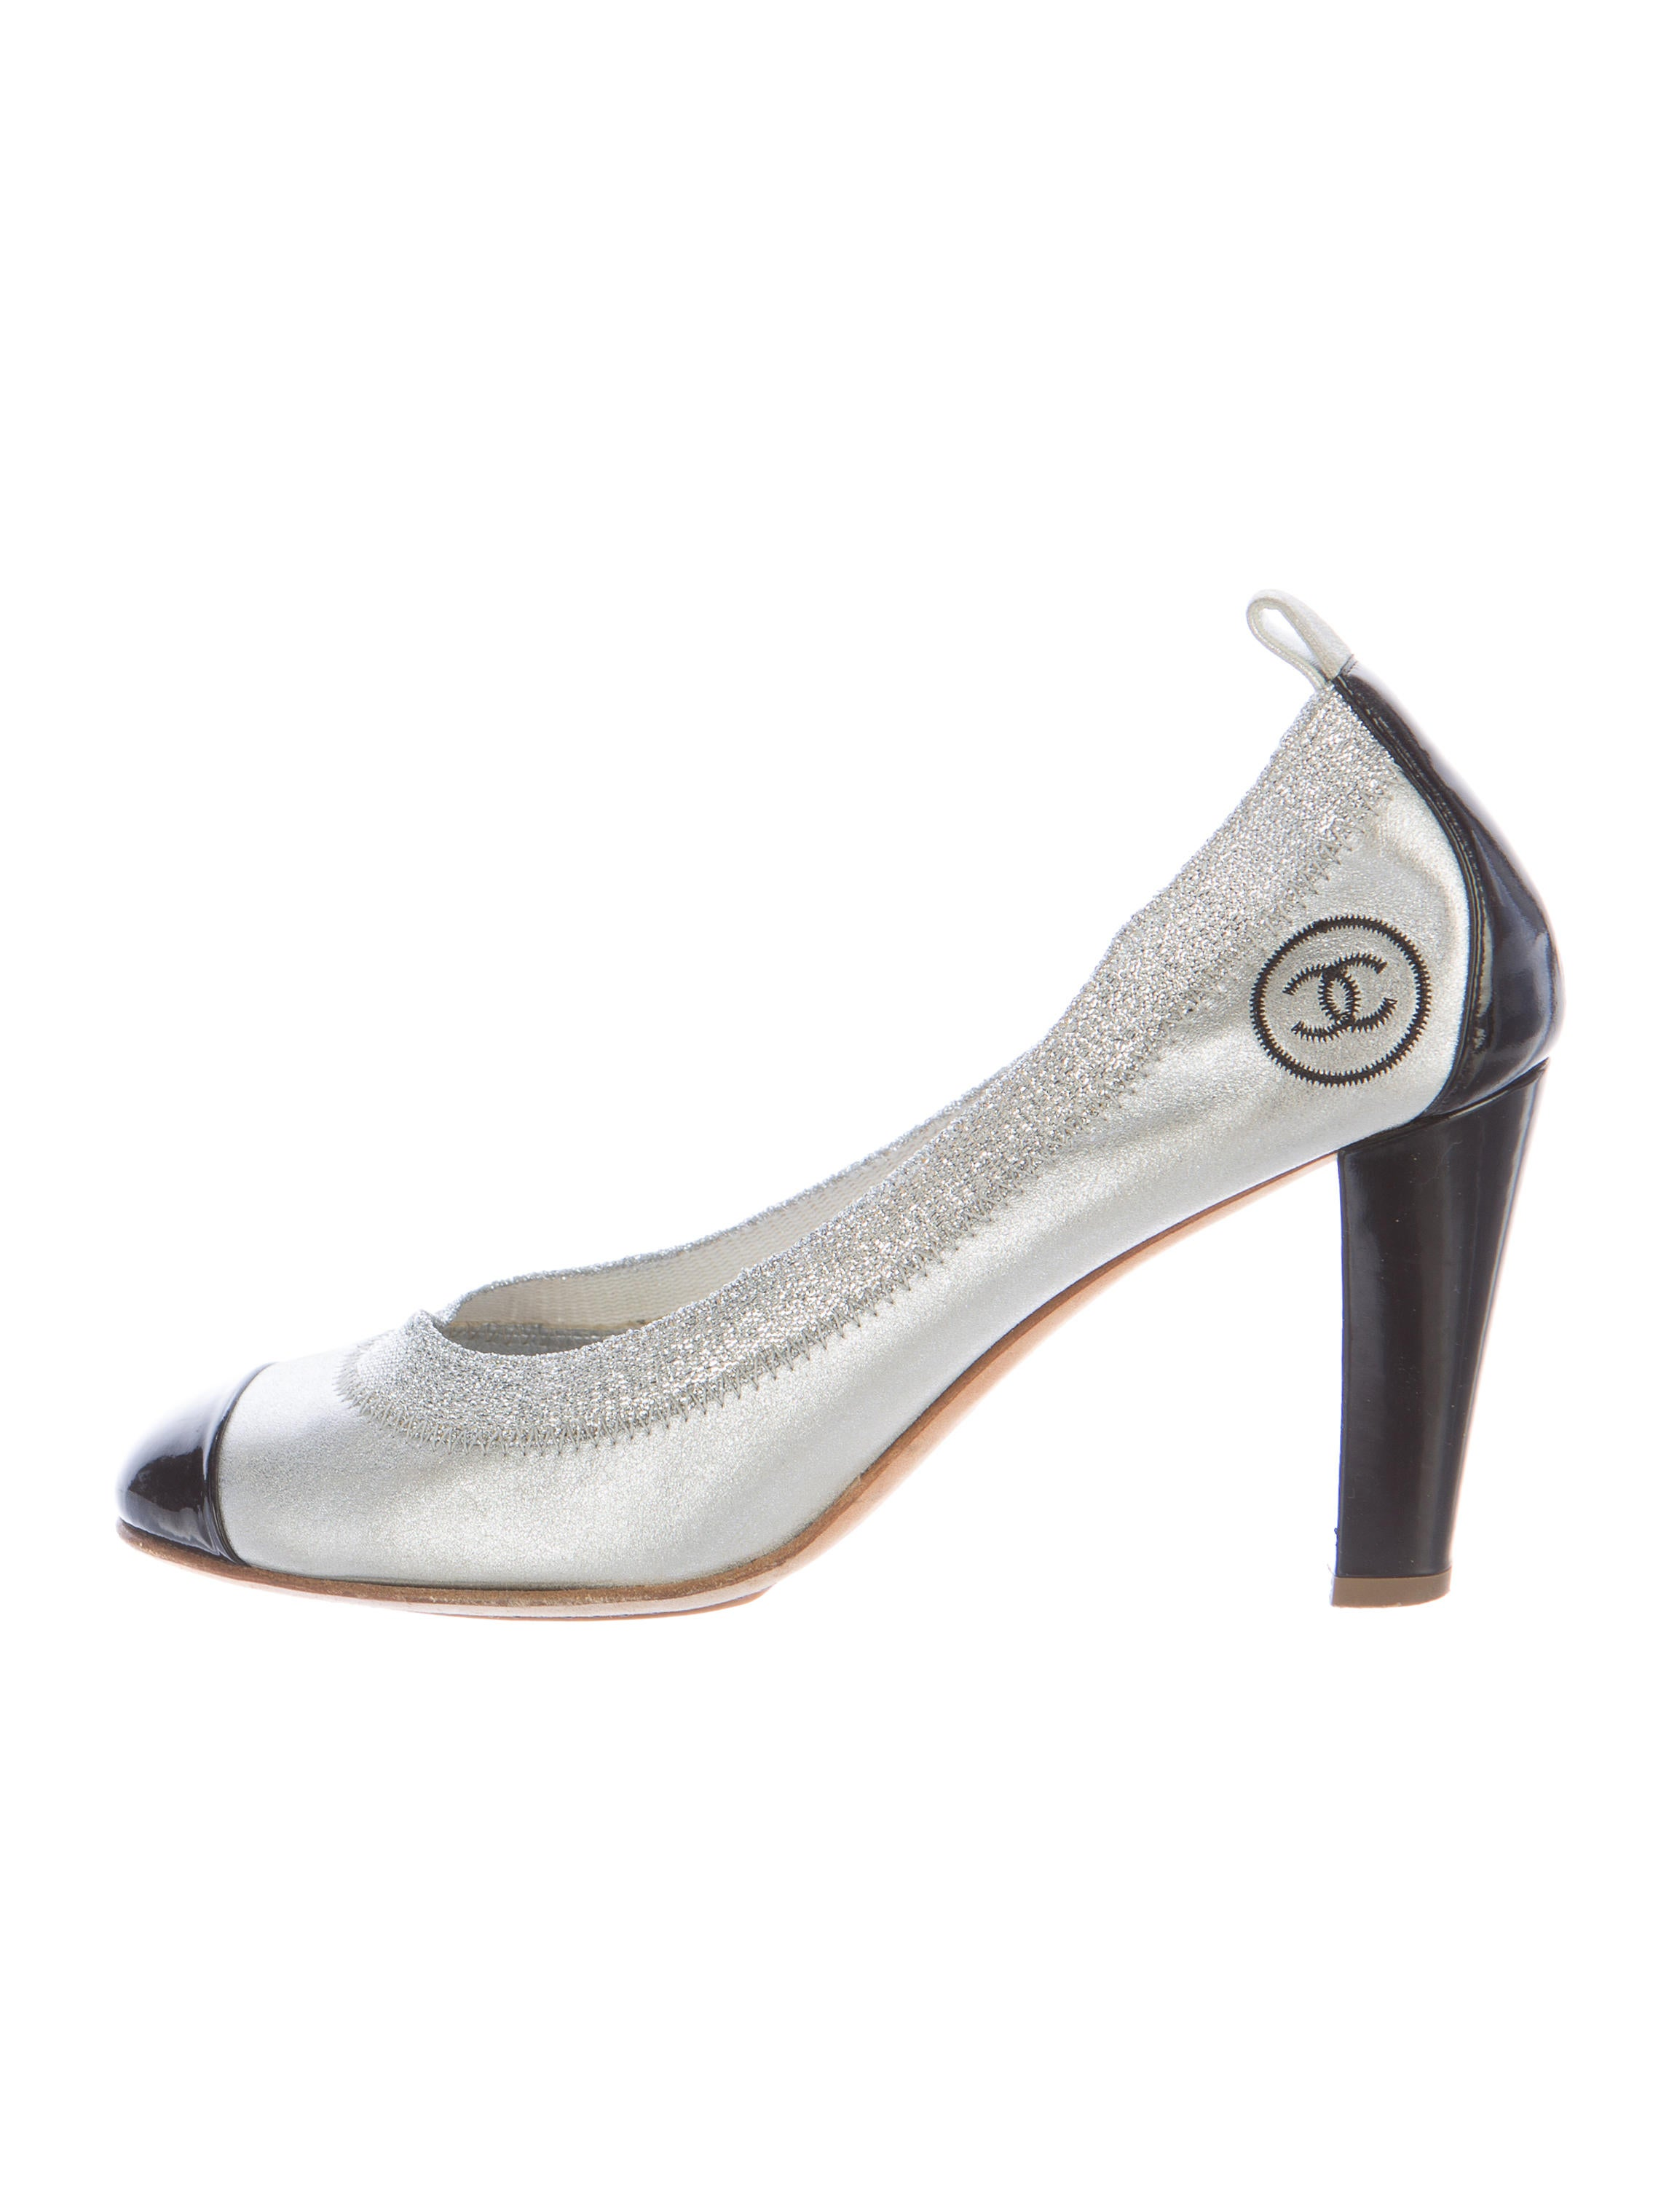 chanel metallic stretch spirit pumps shoes cha158360